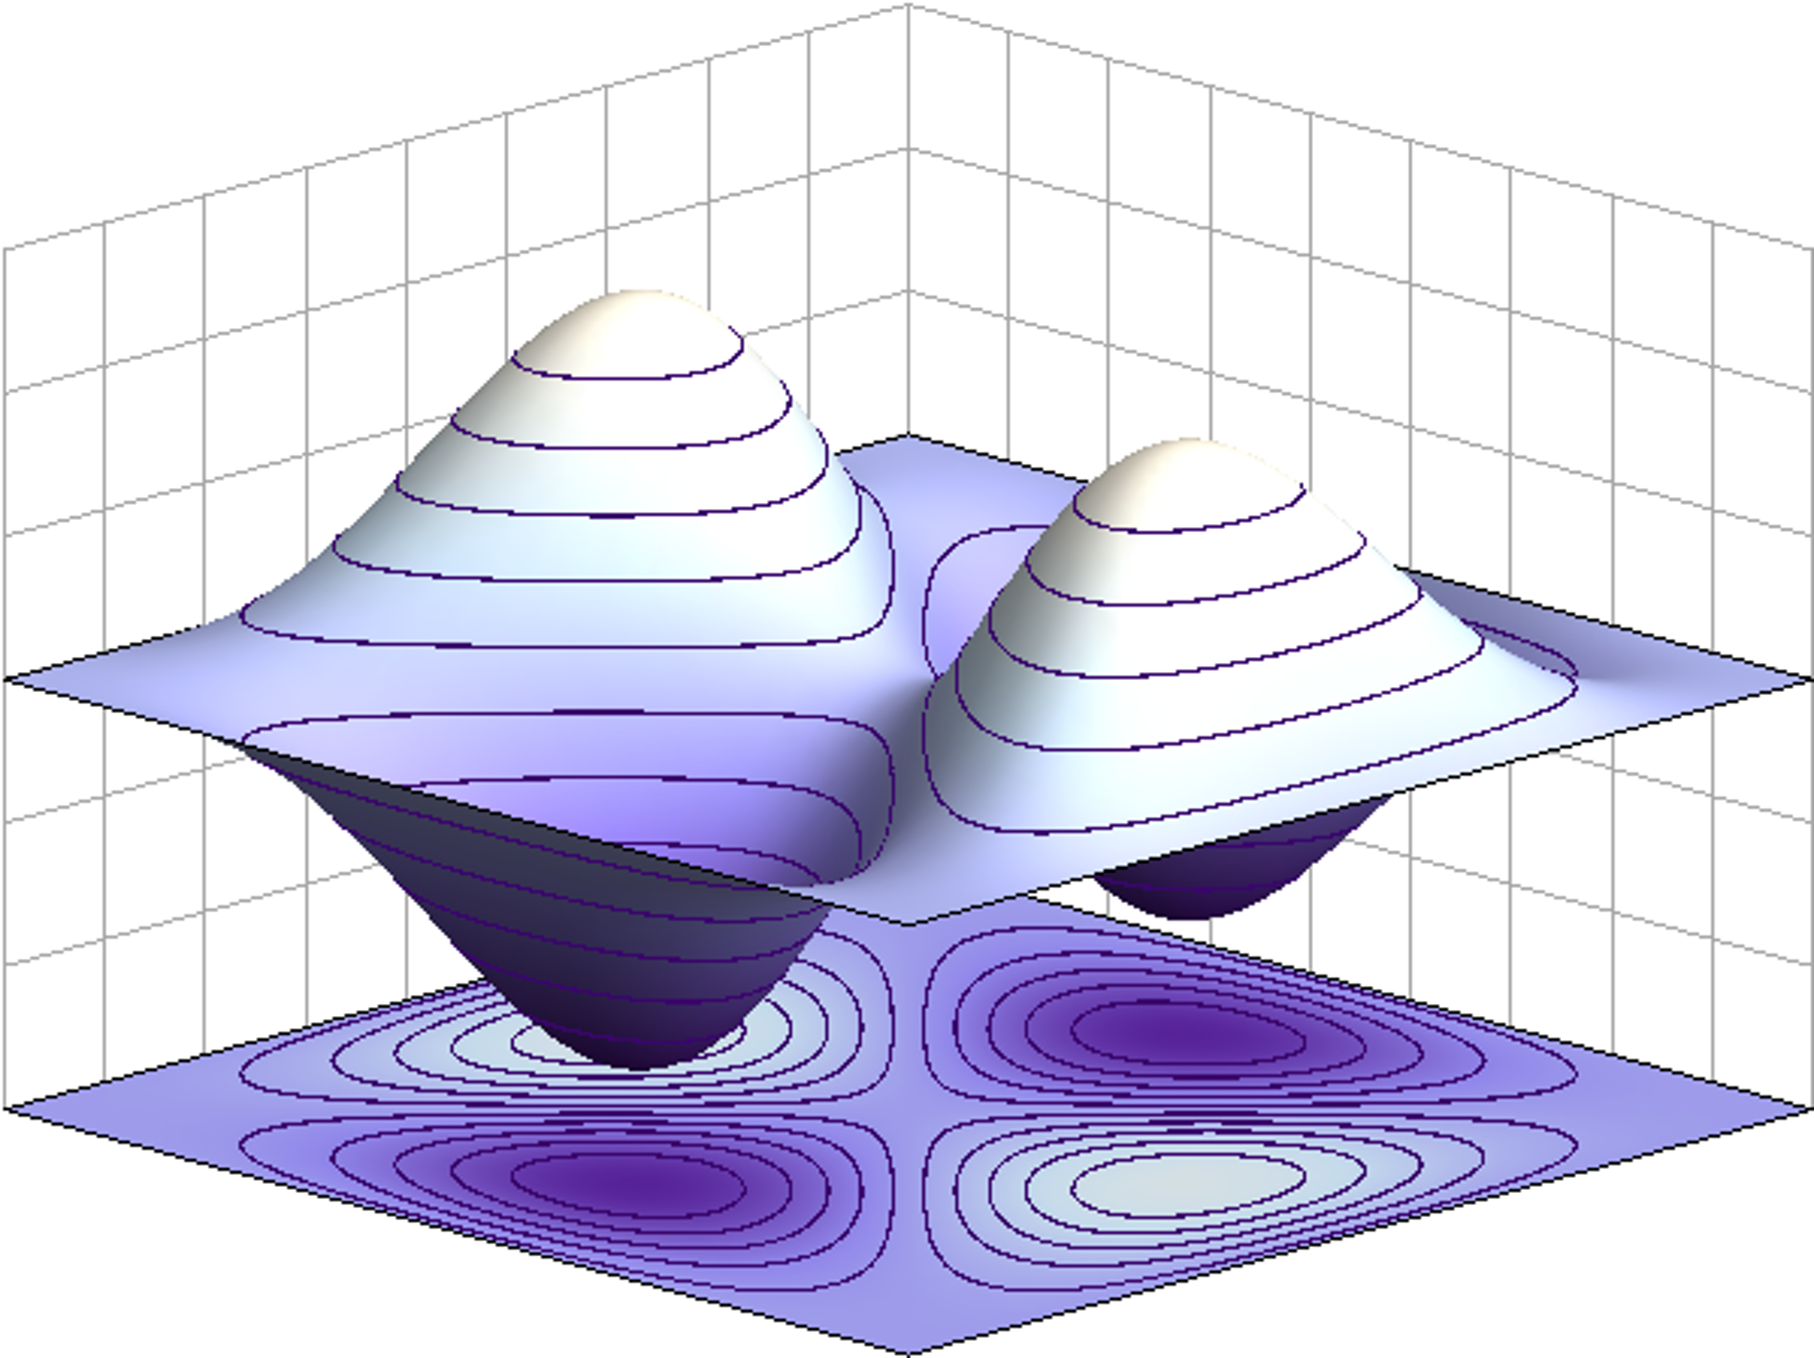 Asymmetricwave2